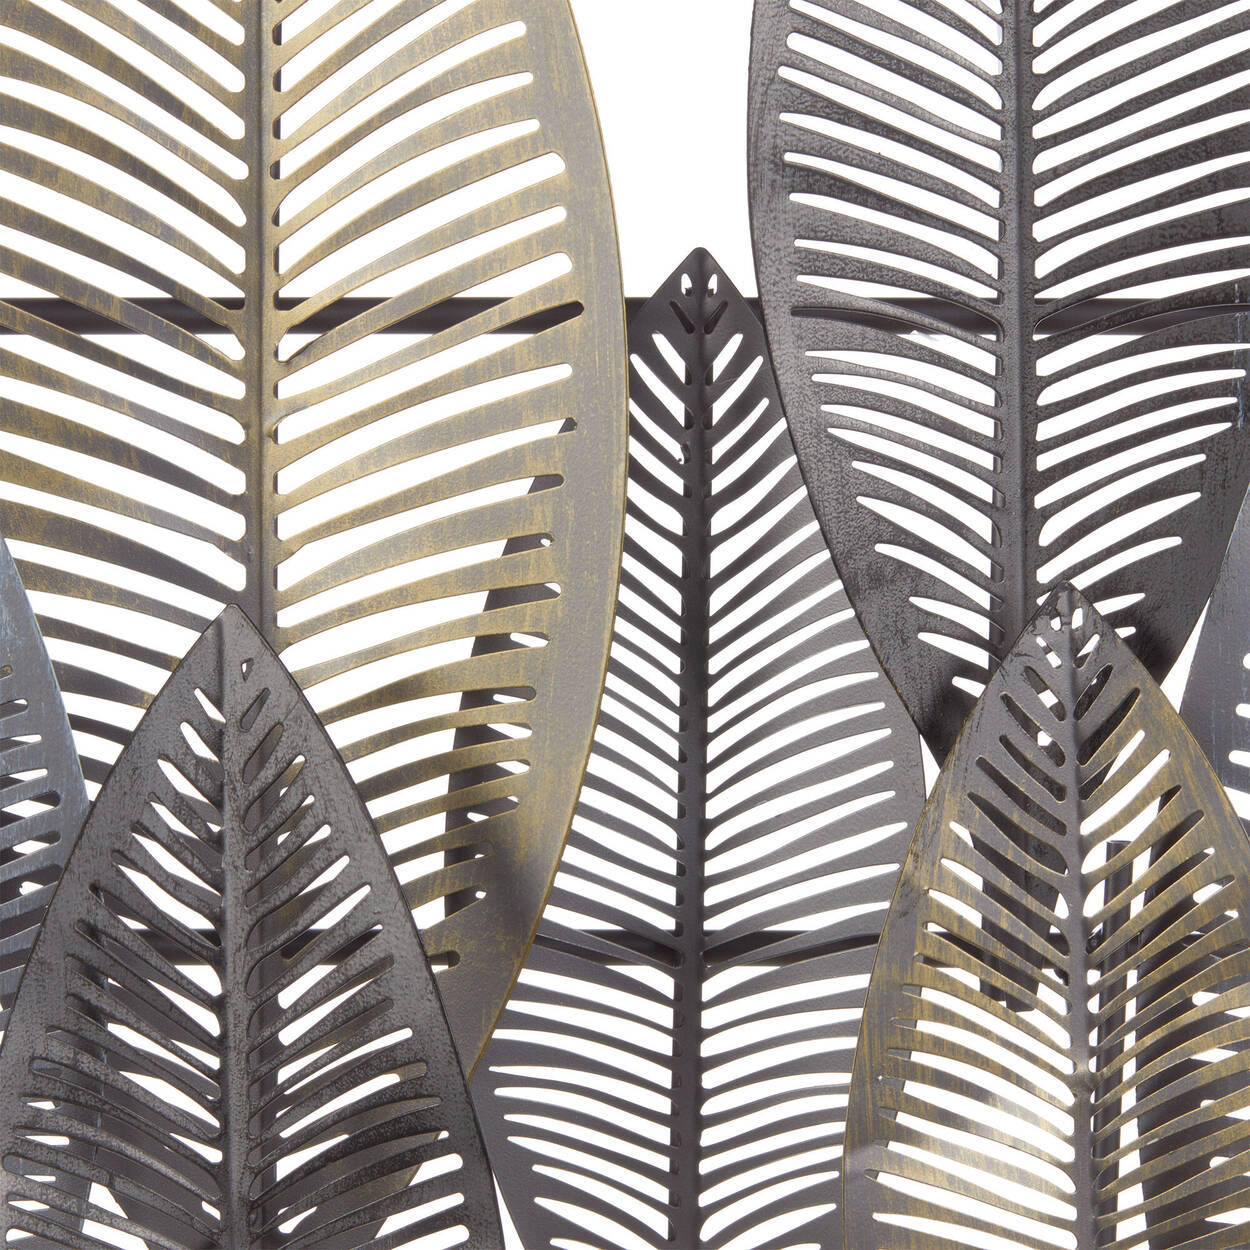 Art mural de feuilles en métal